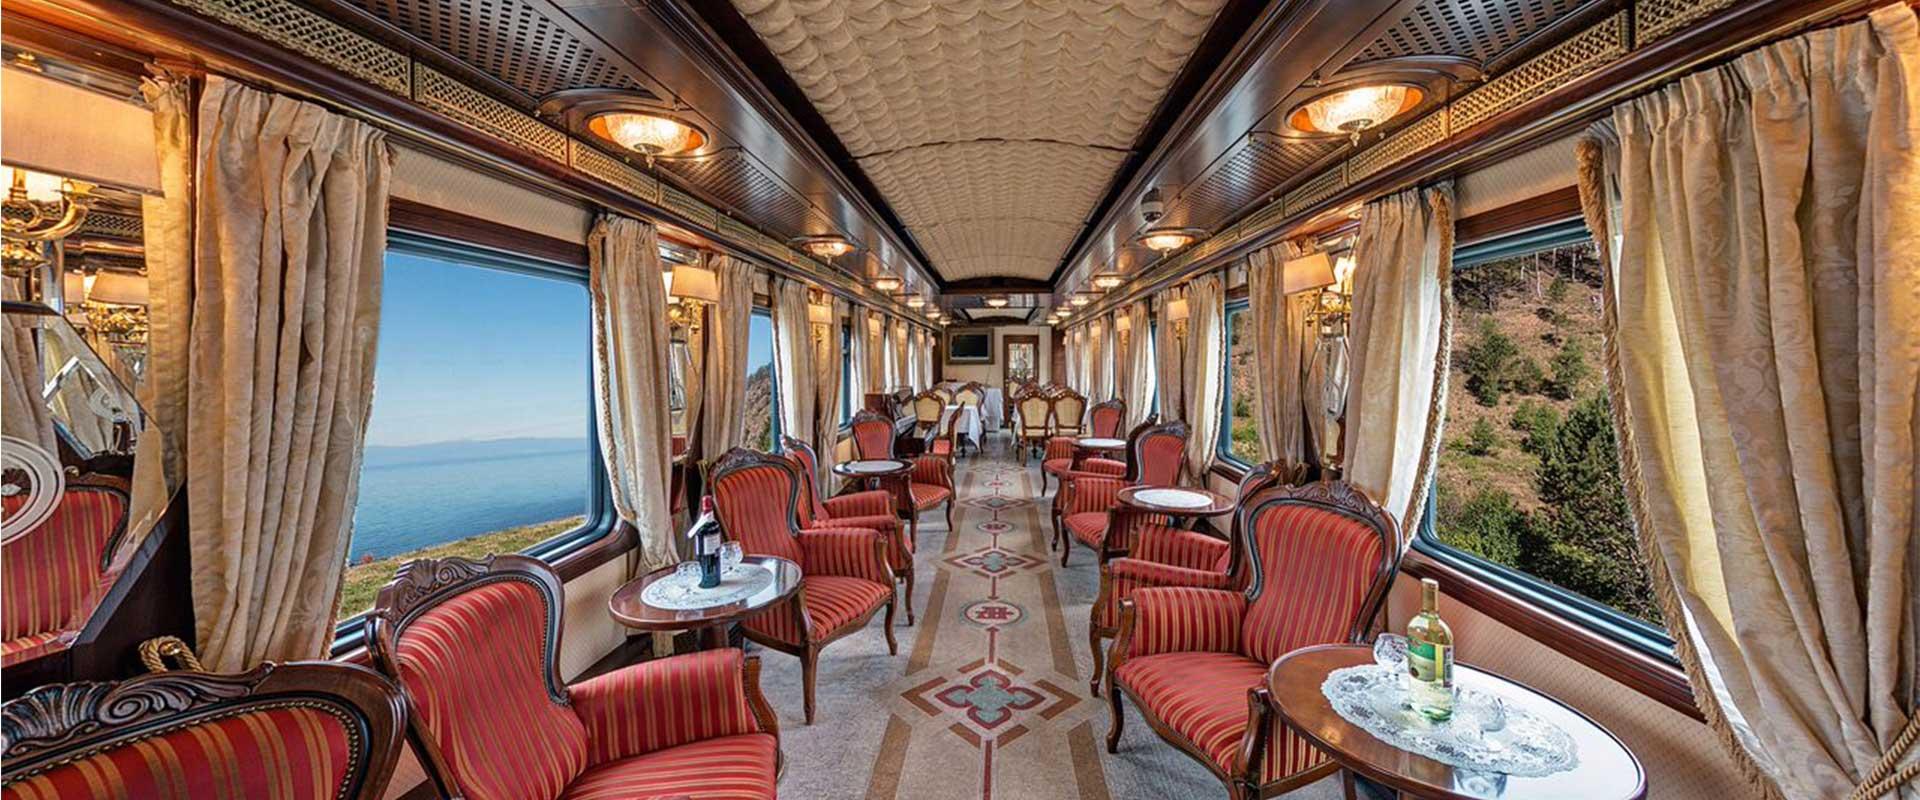 luxury interior of the trans-siberian railway